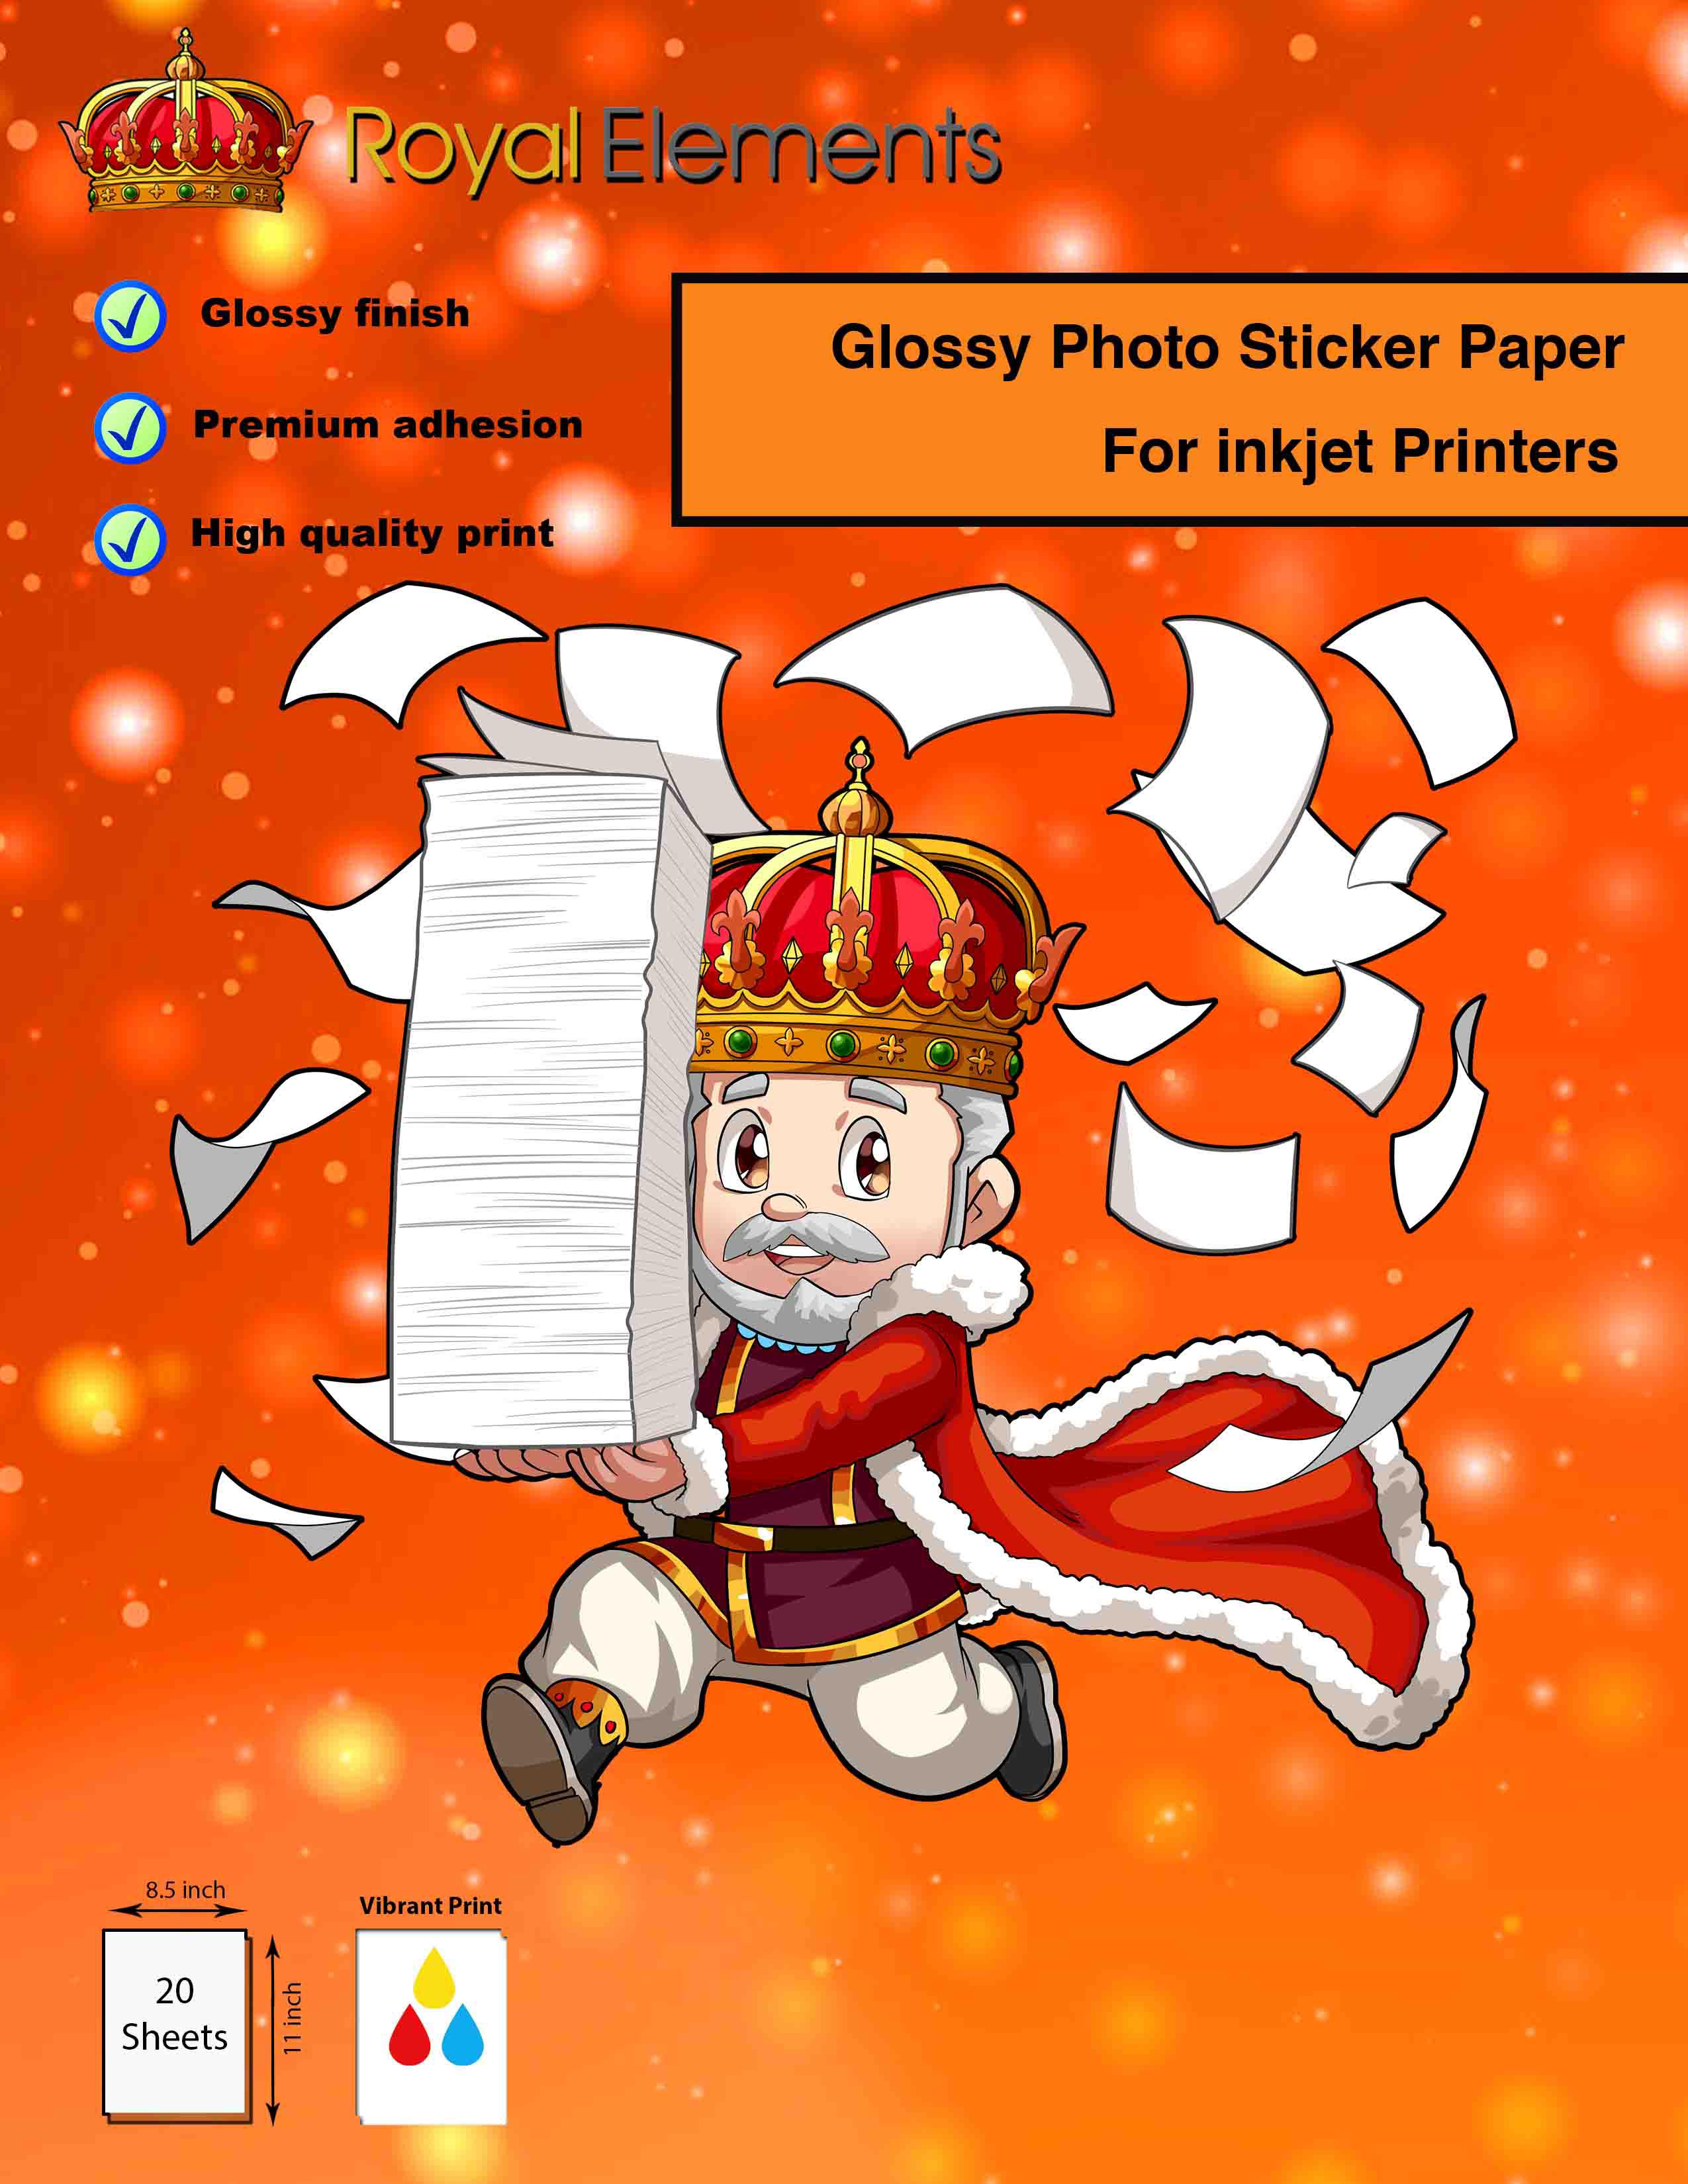 Royal Elements Photo Sticker Paper Sticker Photo Paper Waterslide Decal Paper Decal Paper